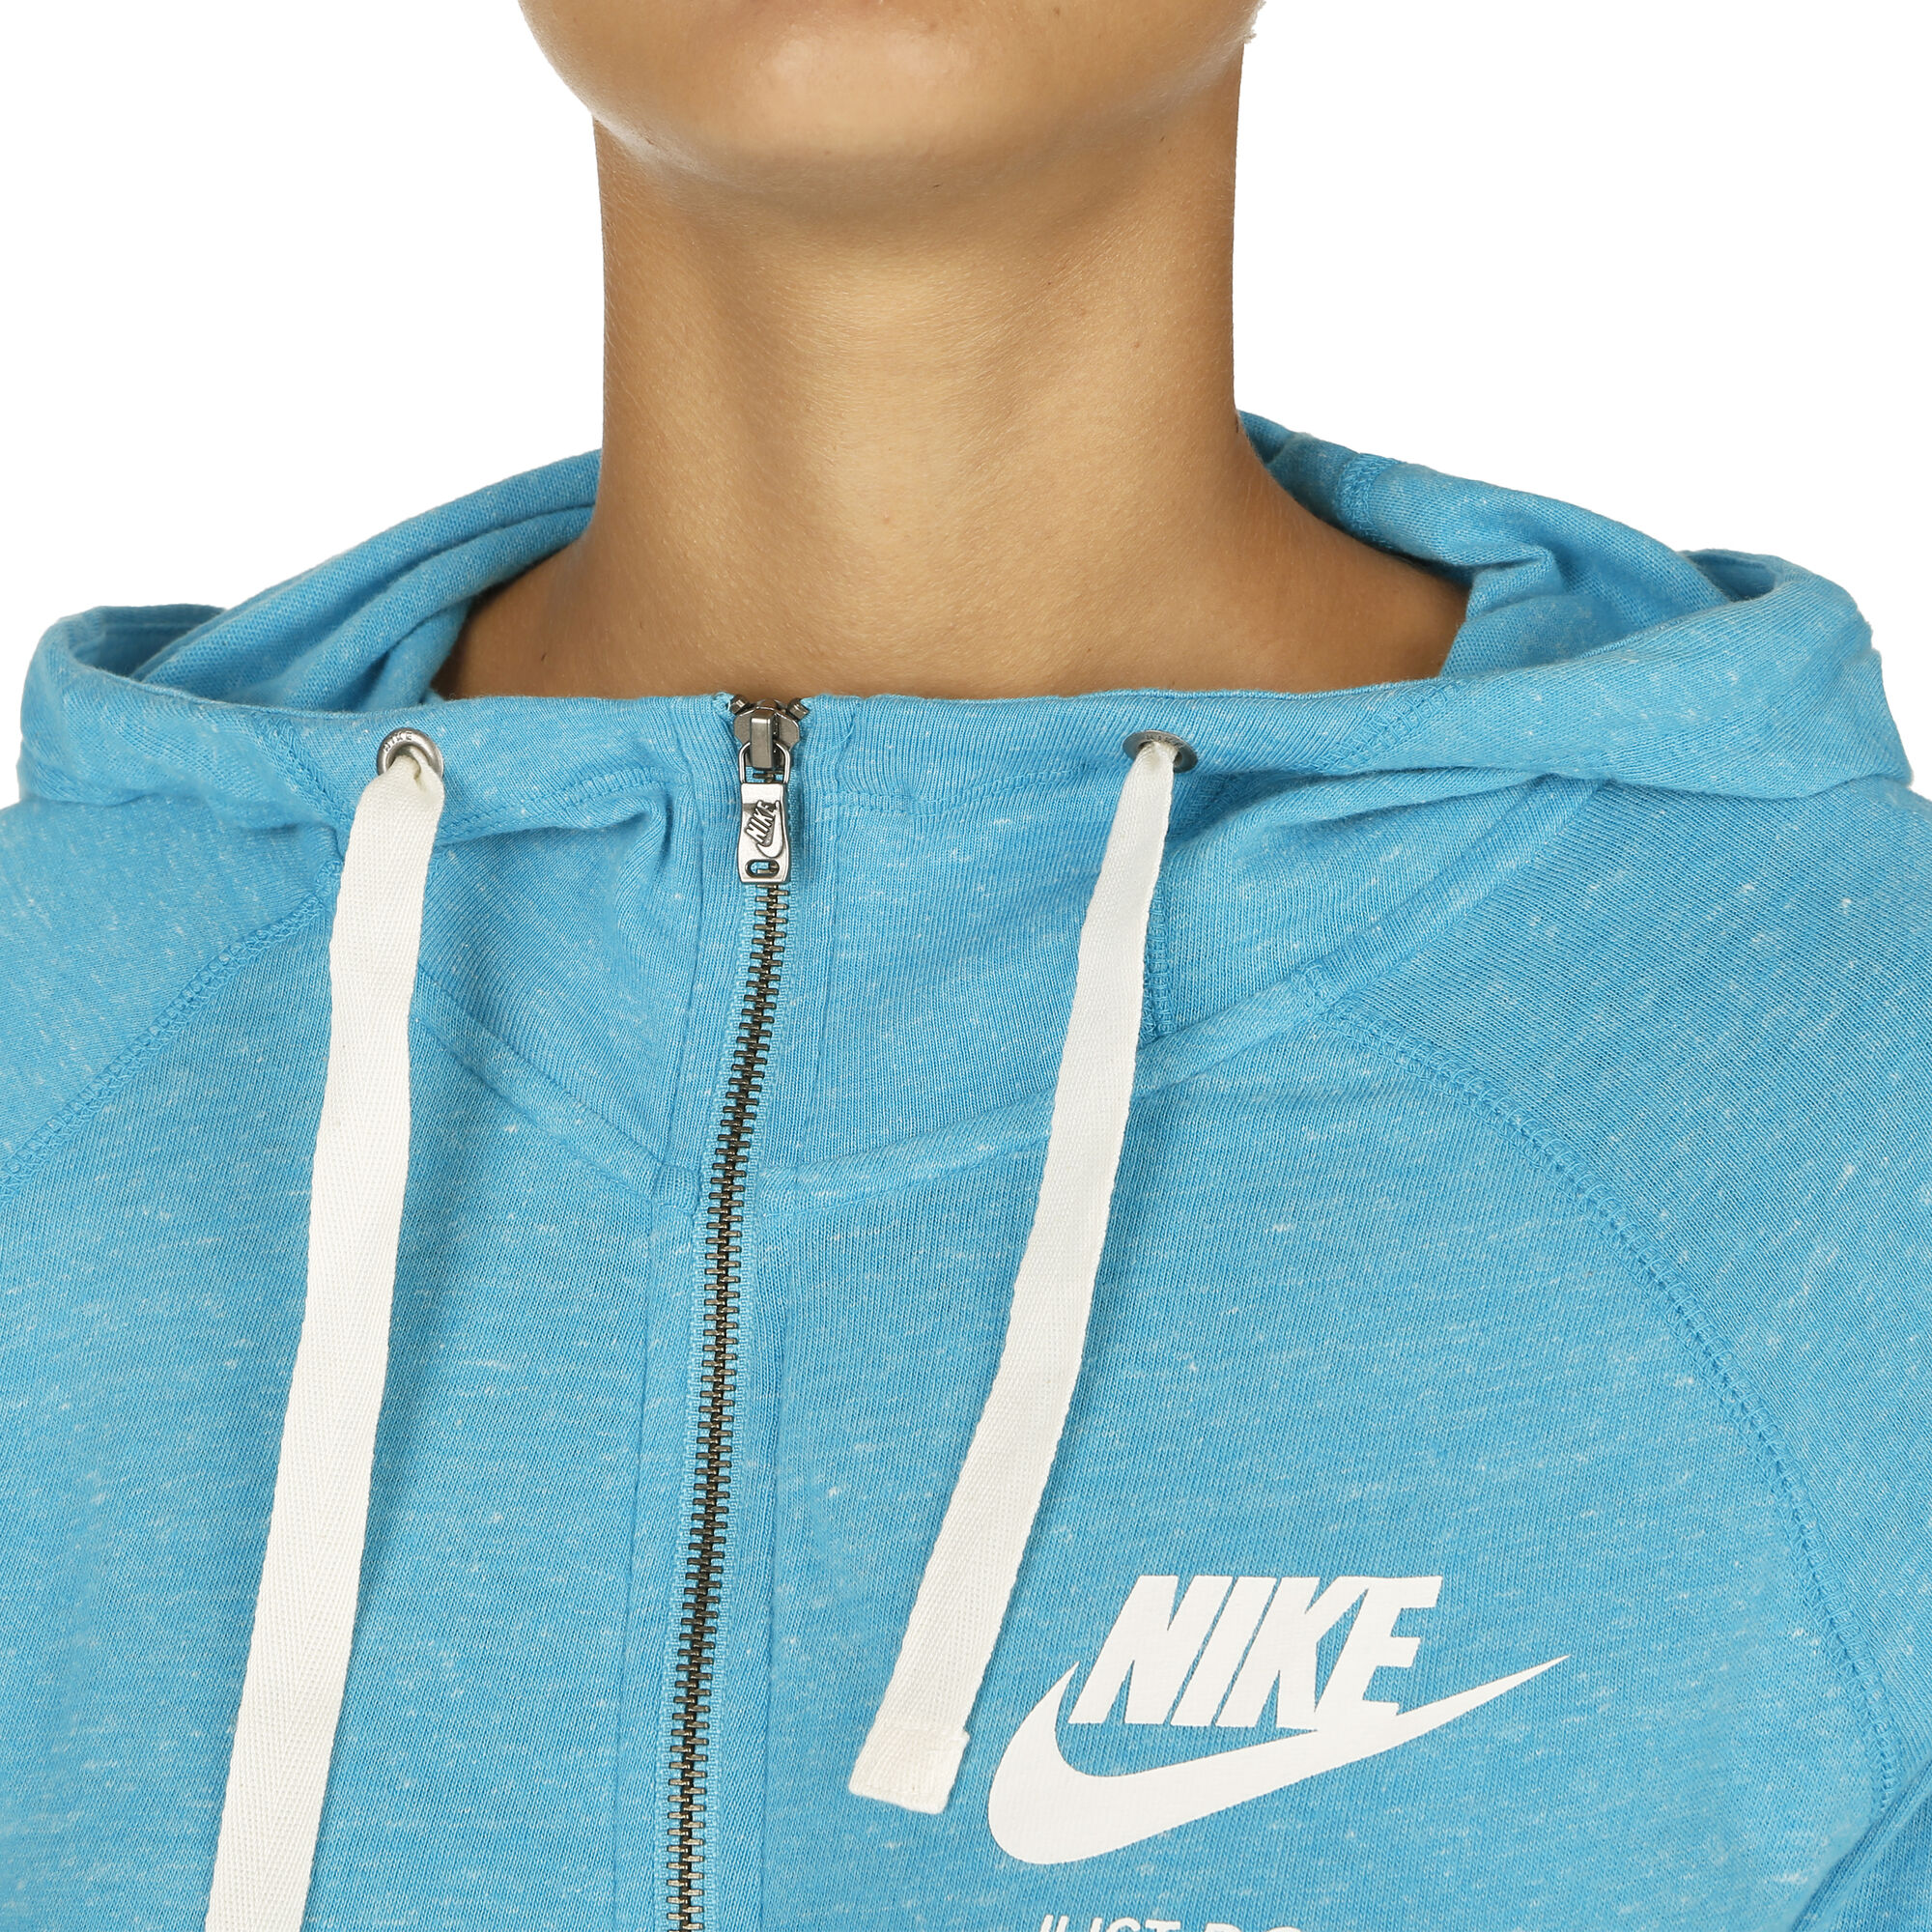 af2e24afb242 buy Nike Gym Vintage Full Zip Hoodie Women - Light Blue